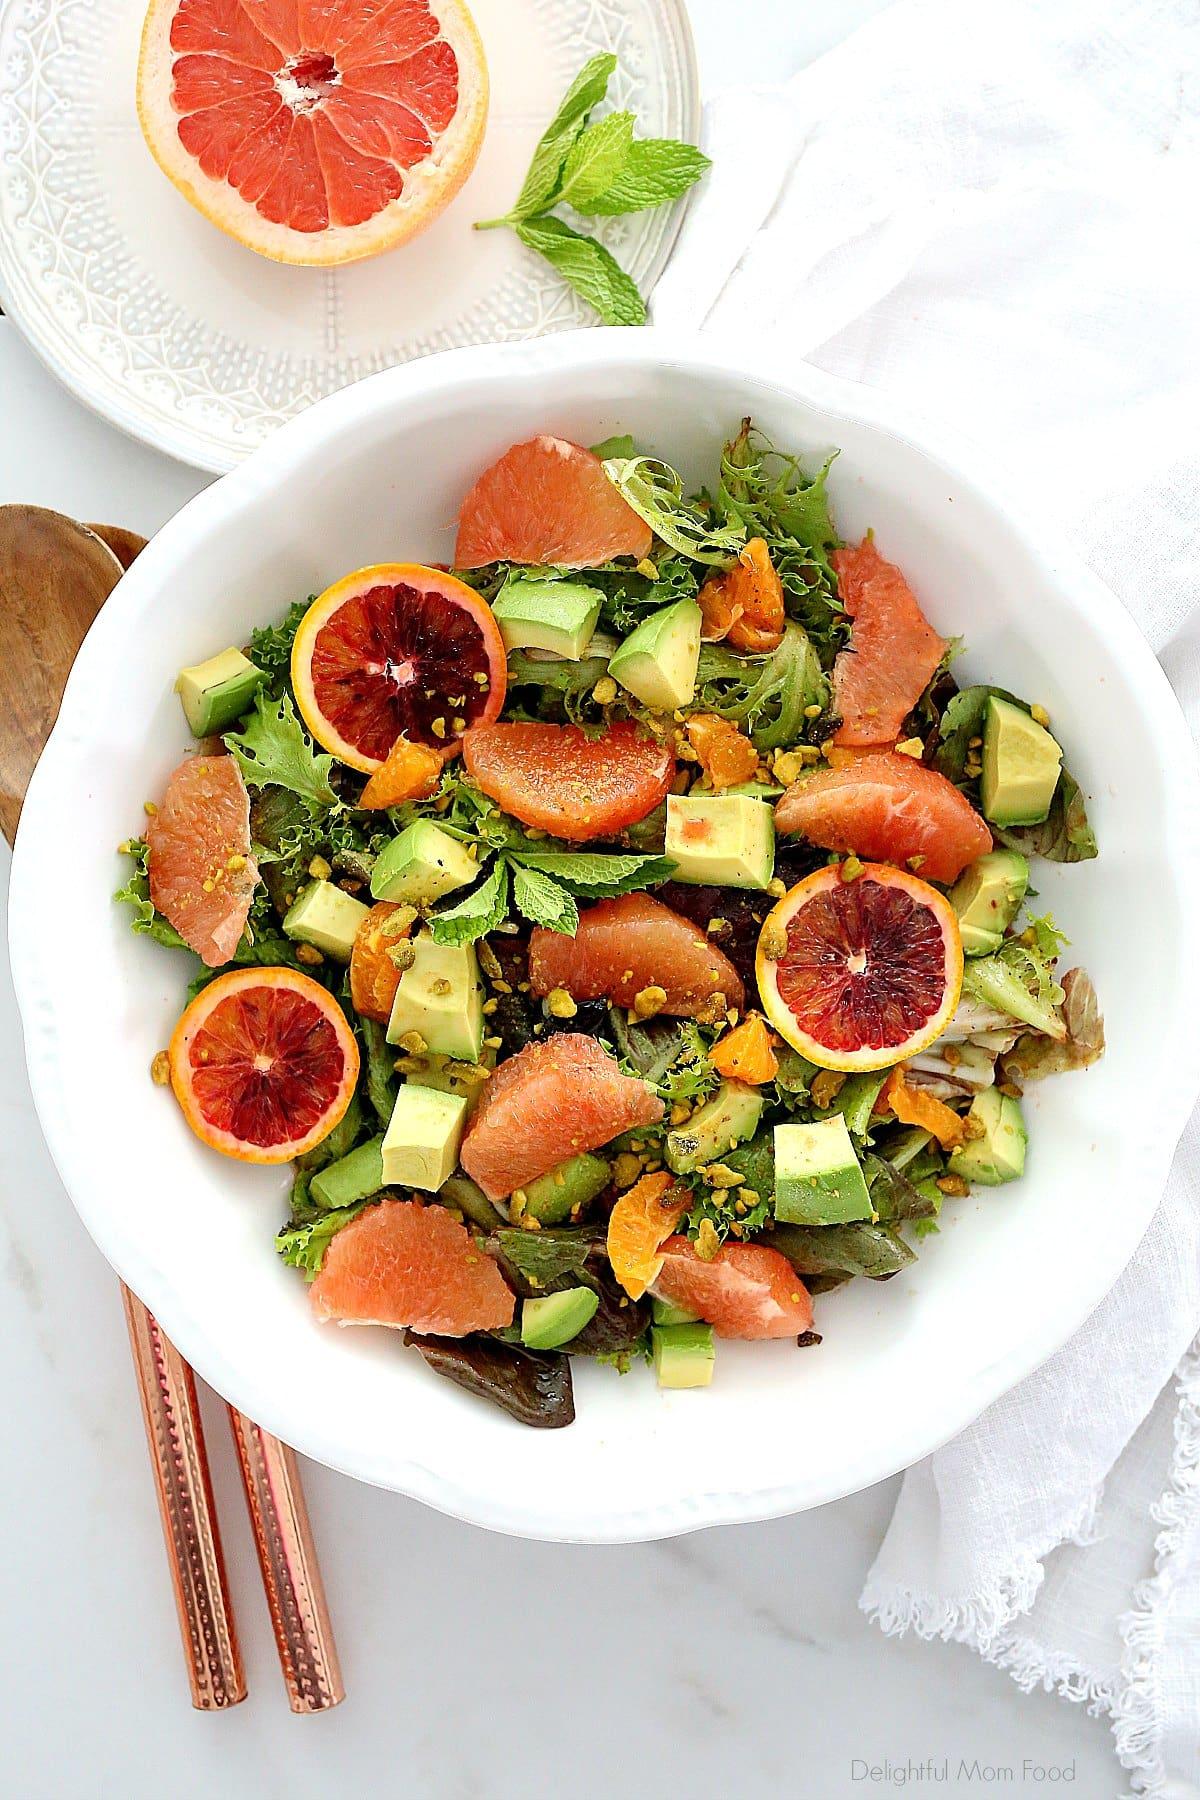 oranges, grapefruit, avocado in a salad